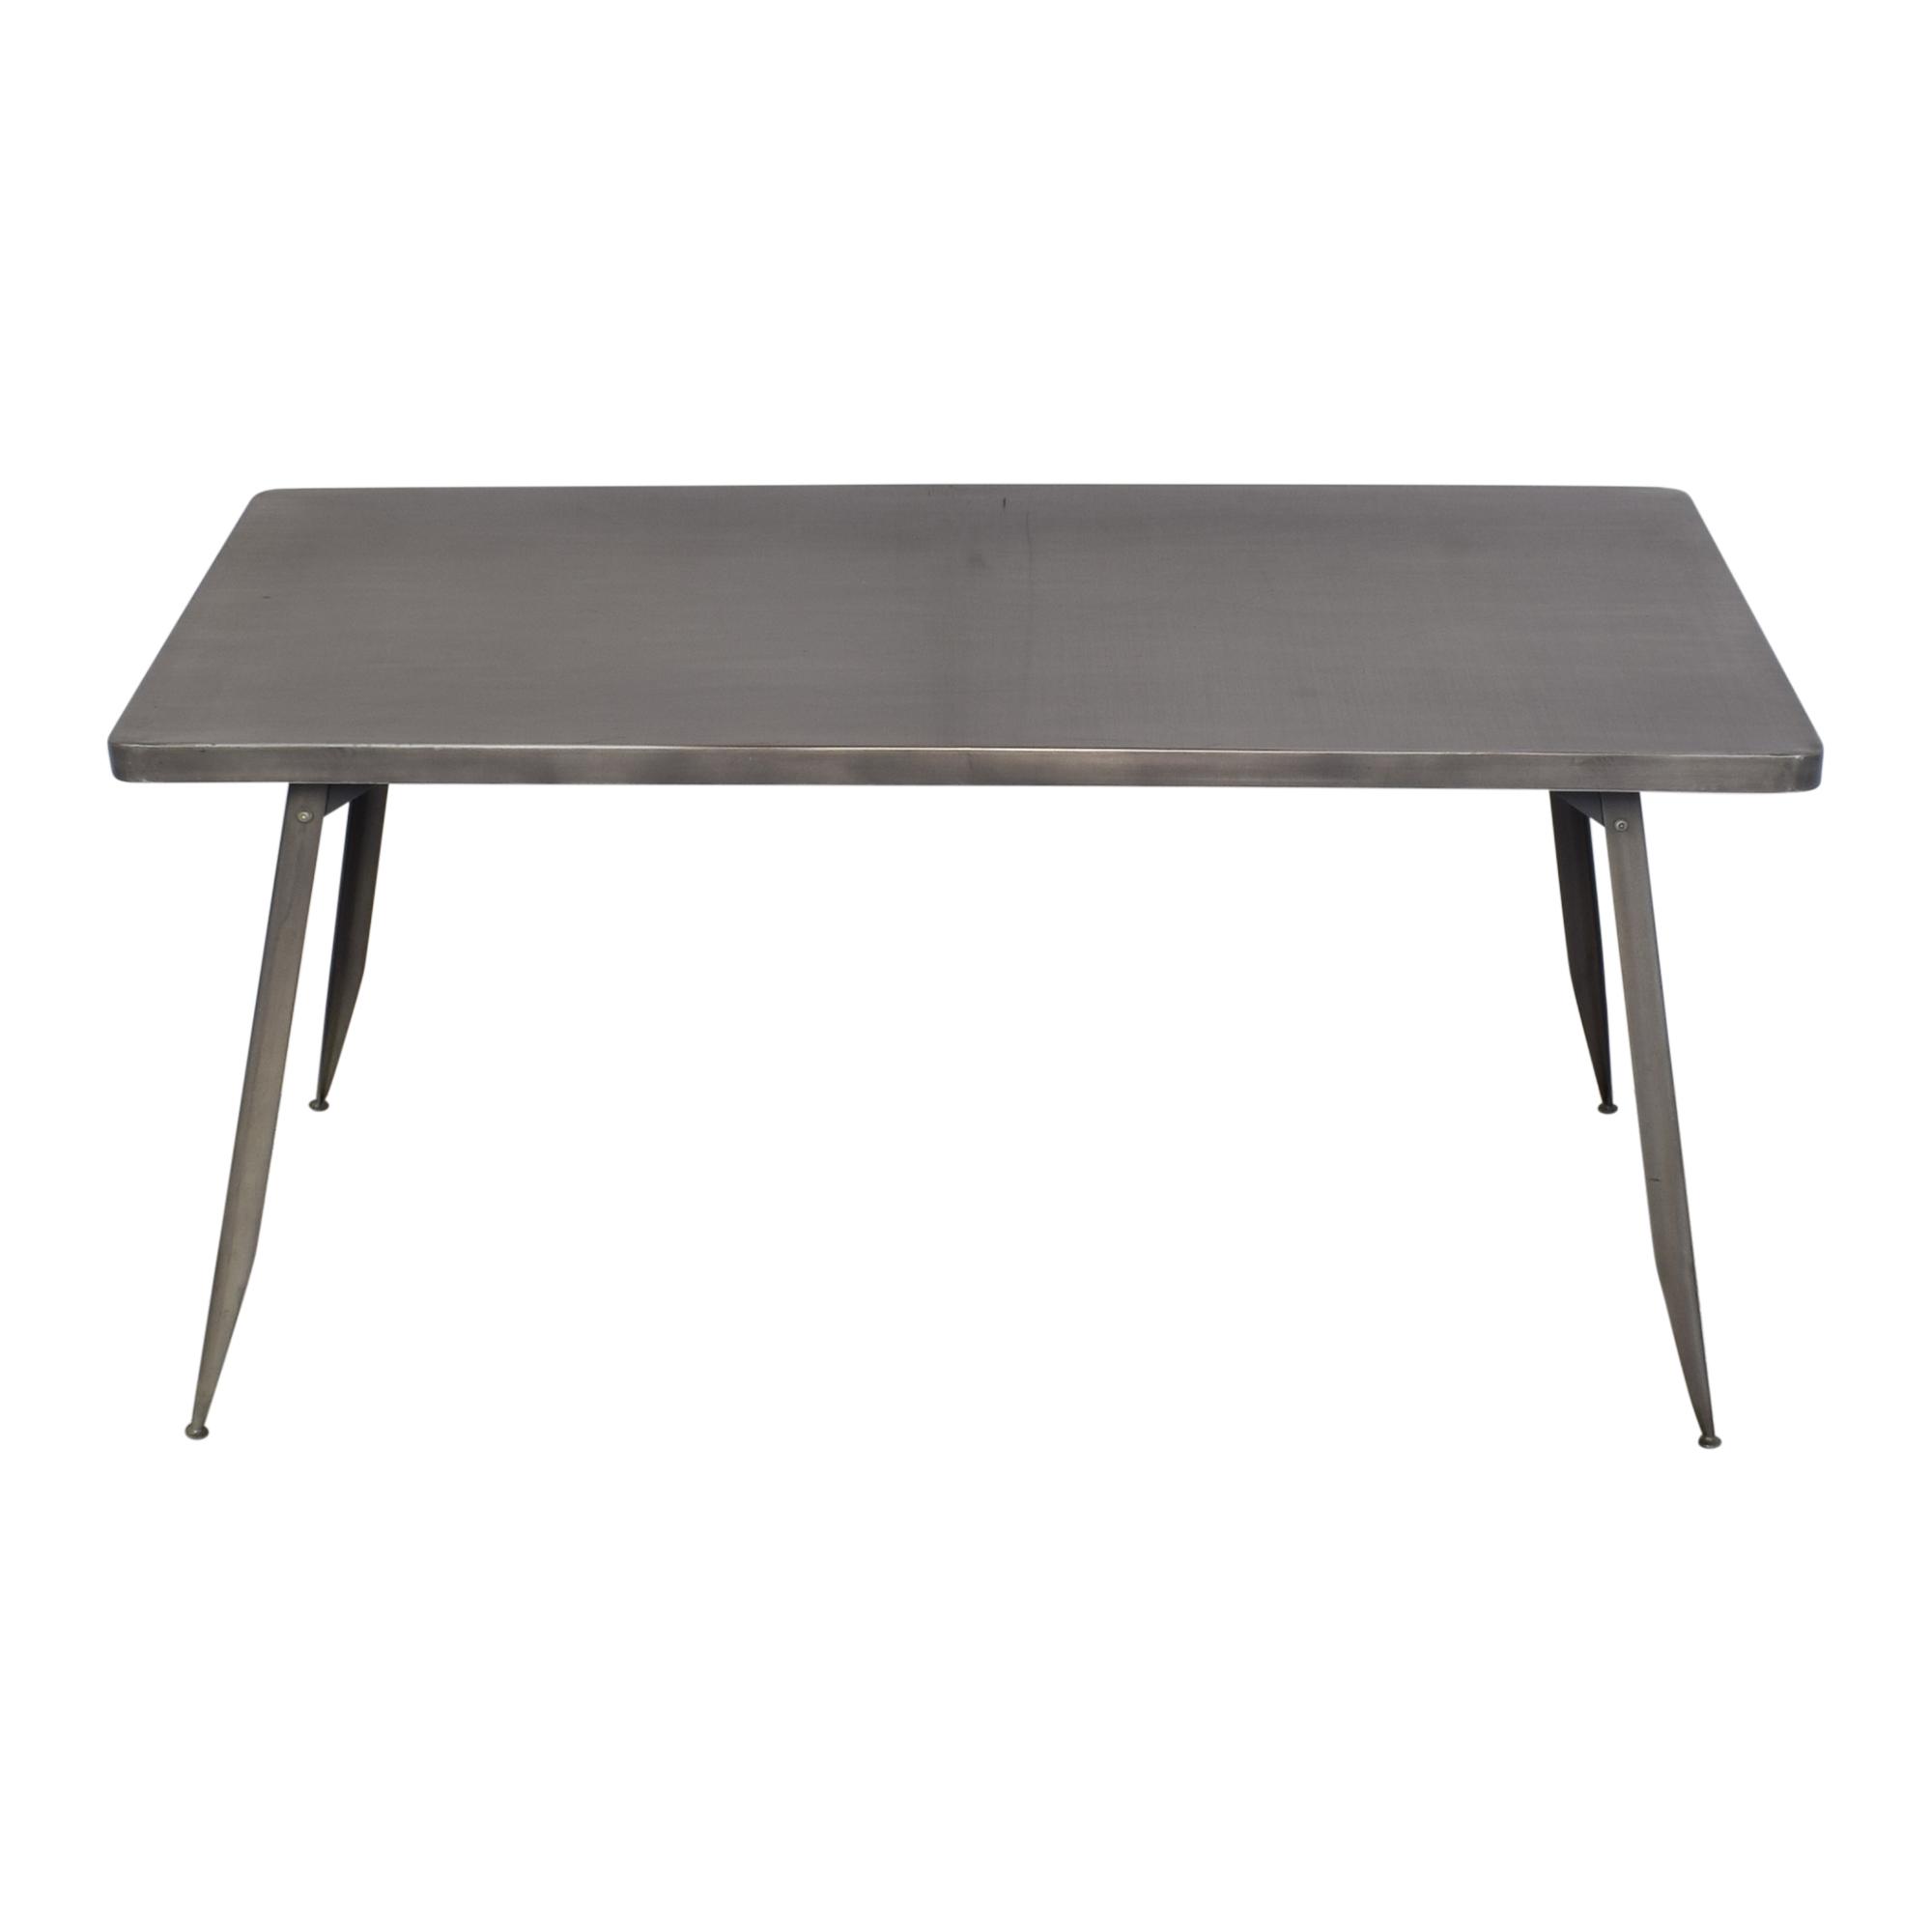 CB2 CB2 Draught Dining Table Tables